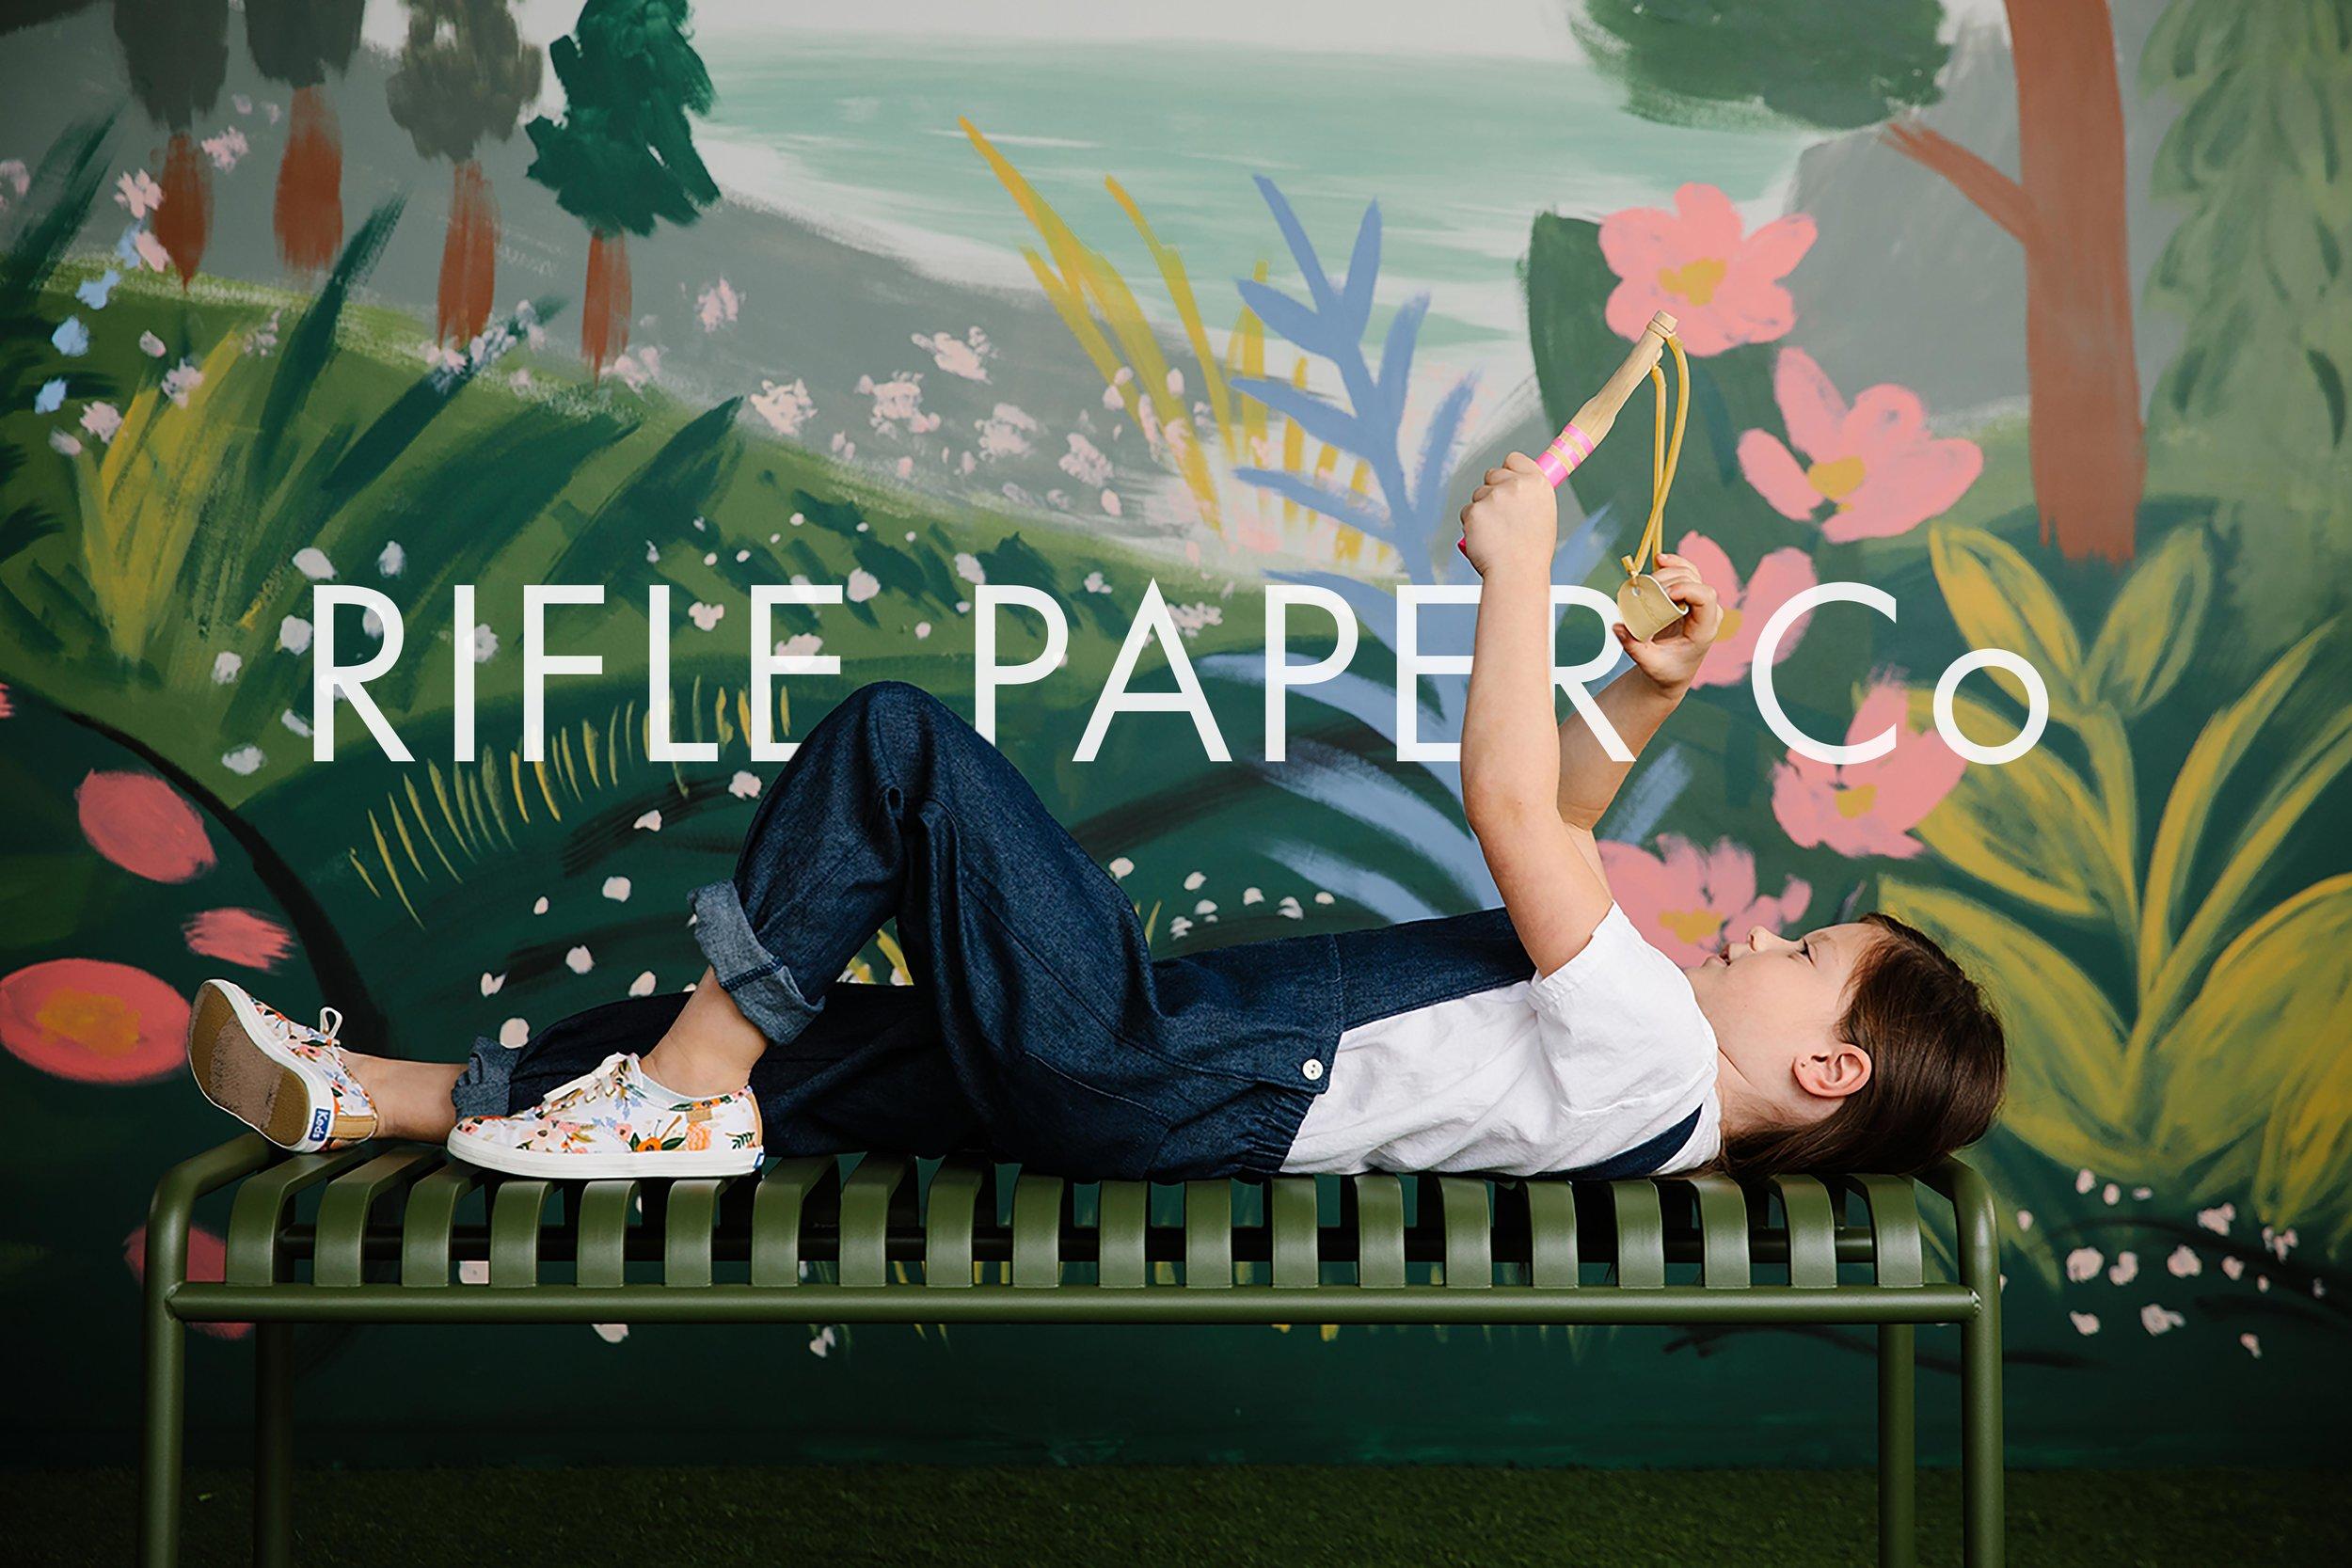 rifle-paper